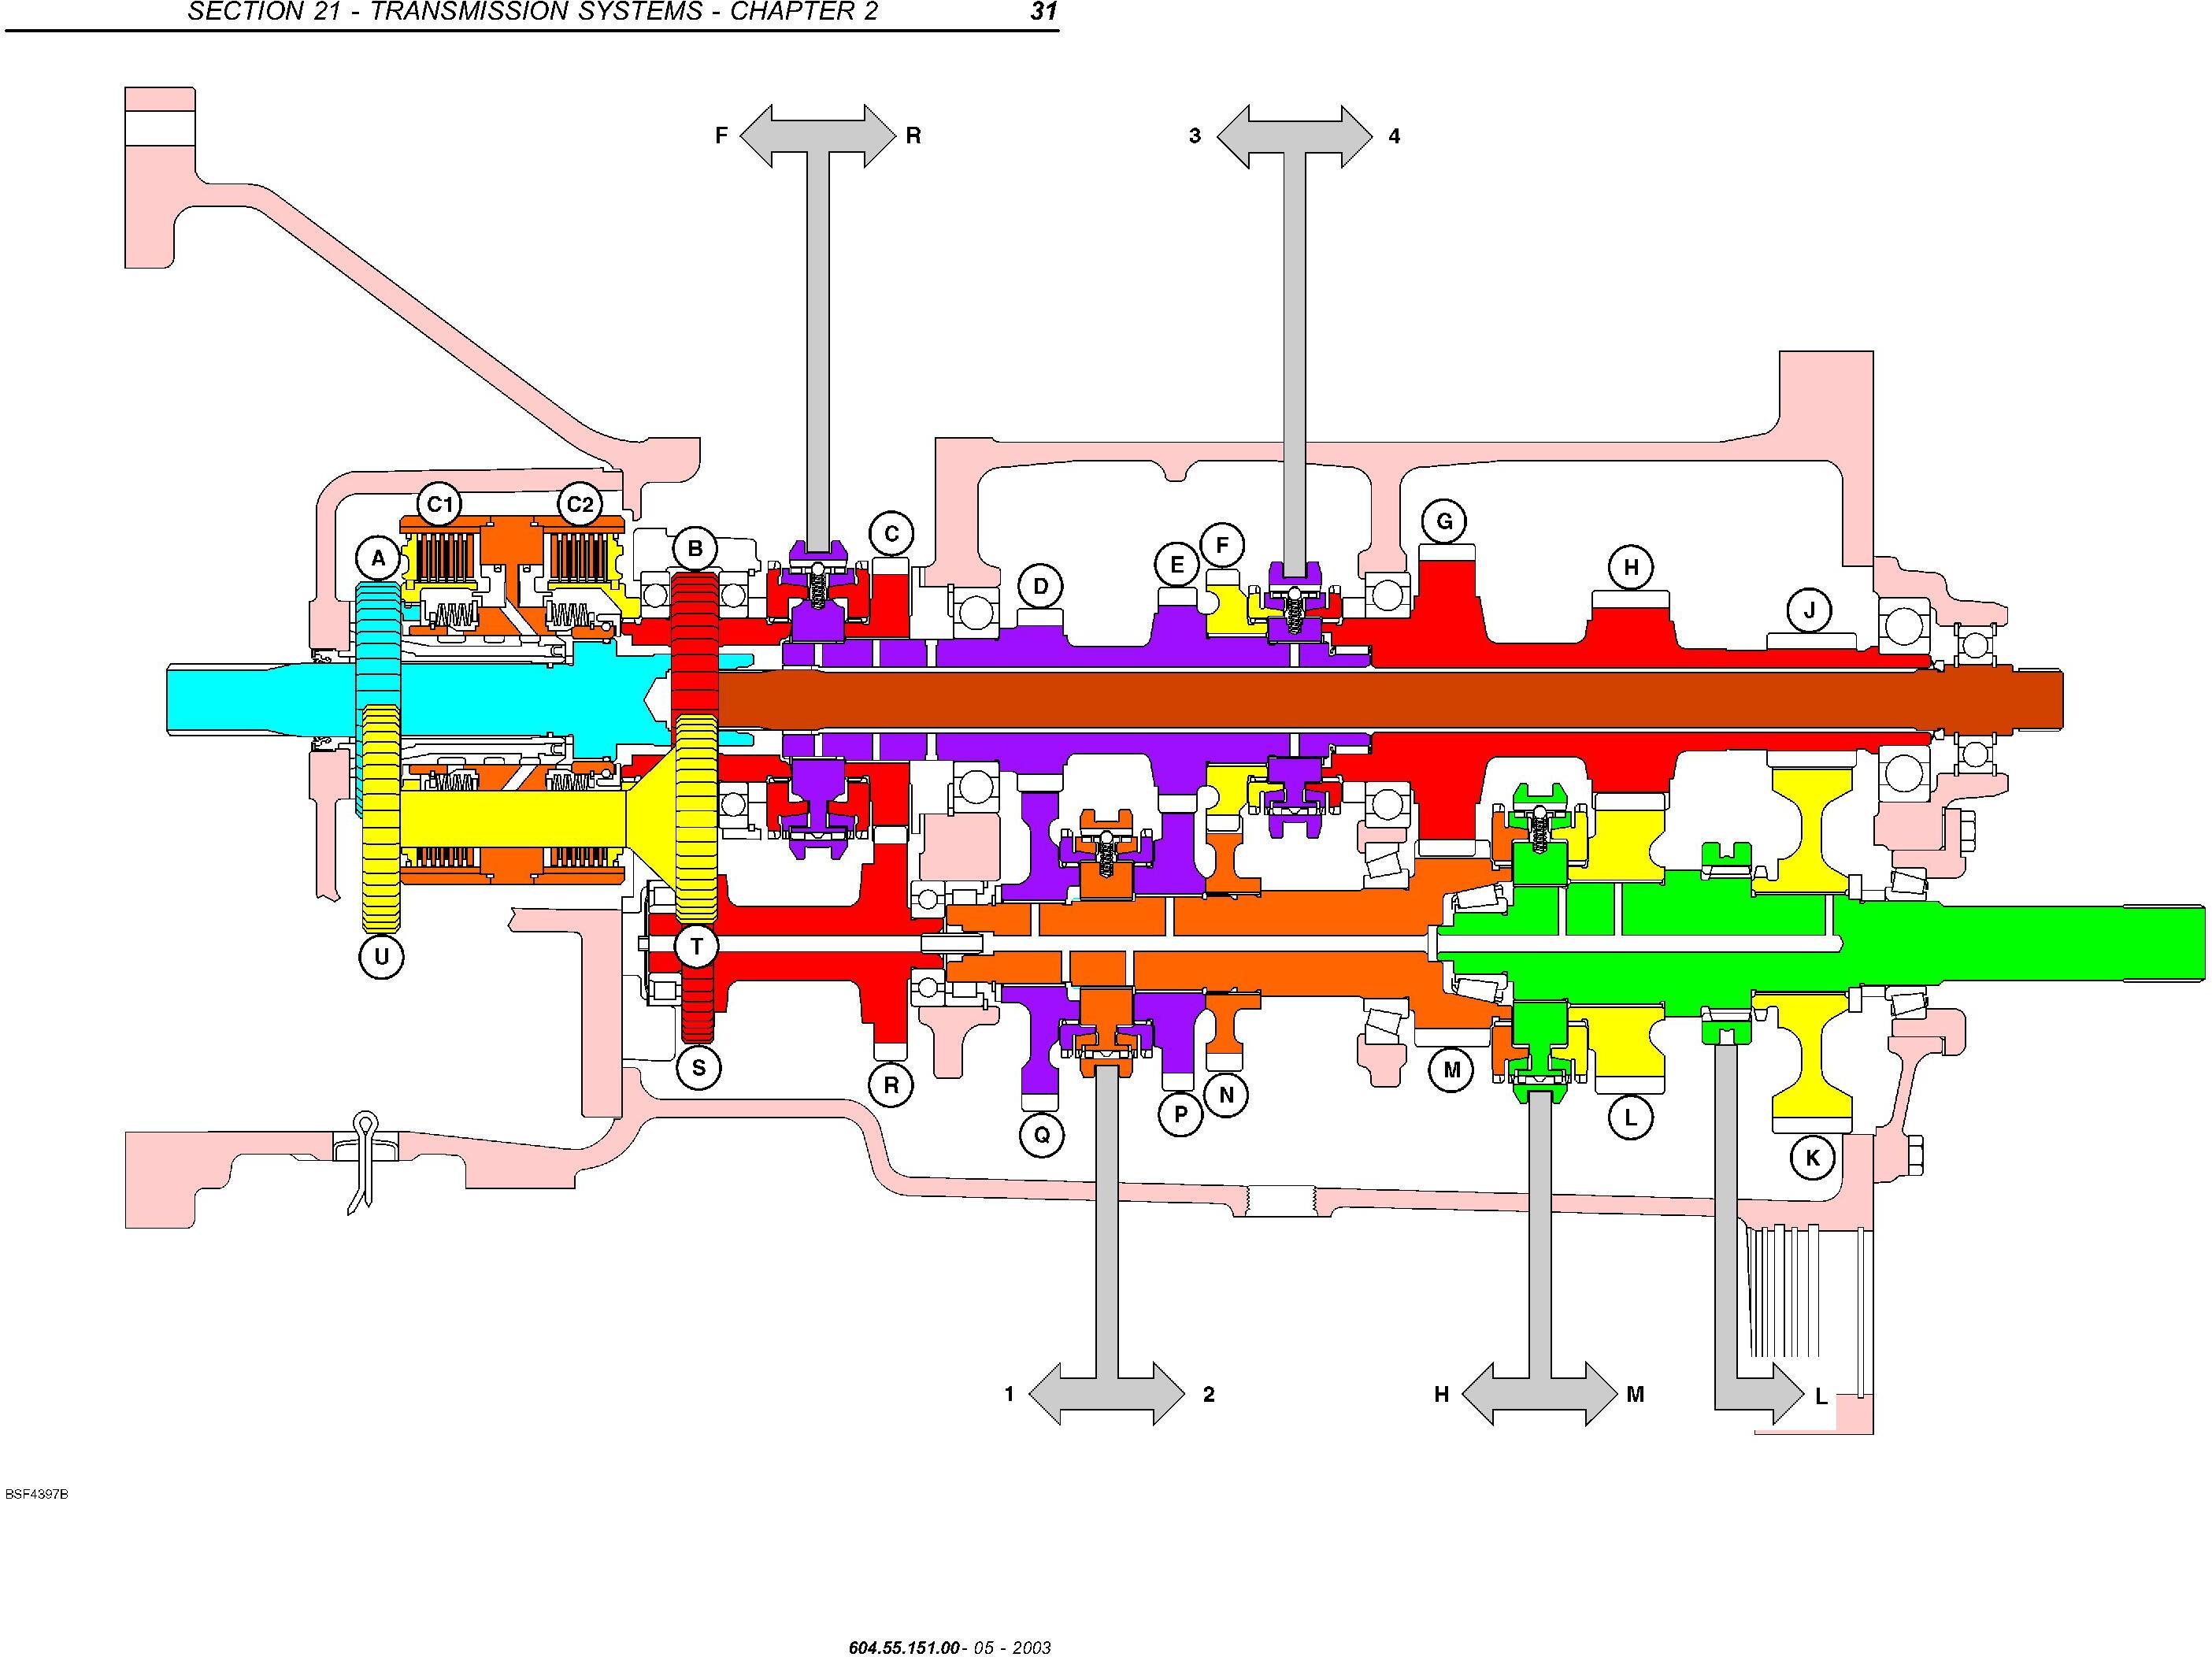 New Holland TS100A, TS110A, TS115A, TS125A, TS130A, TS135A Service Manual - 3